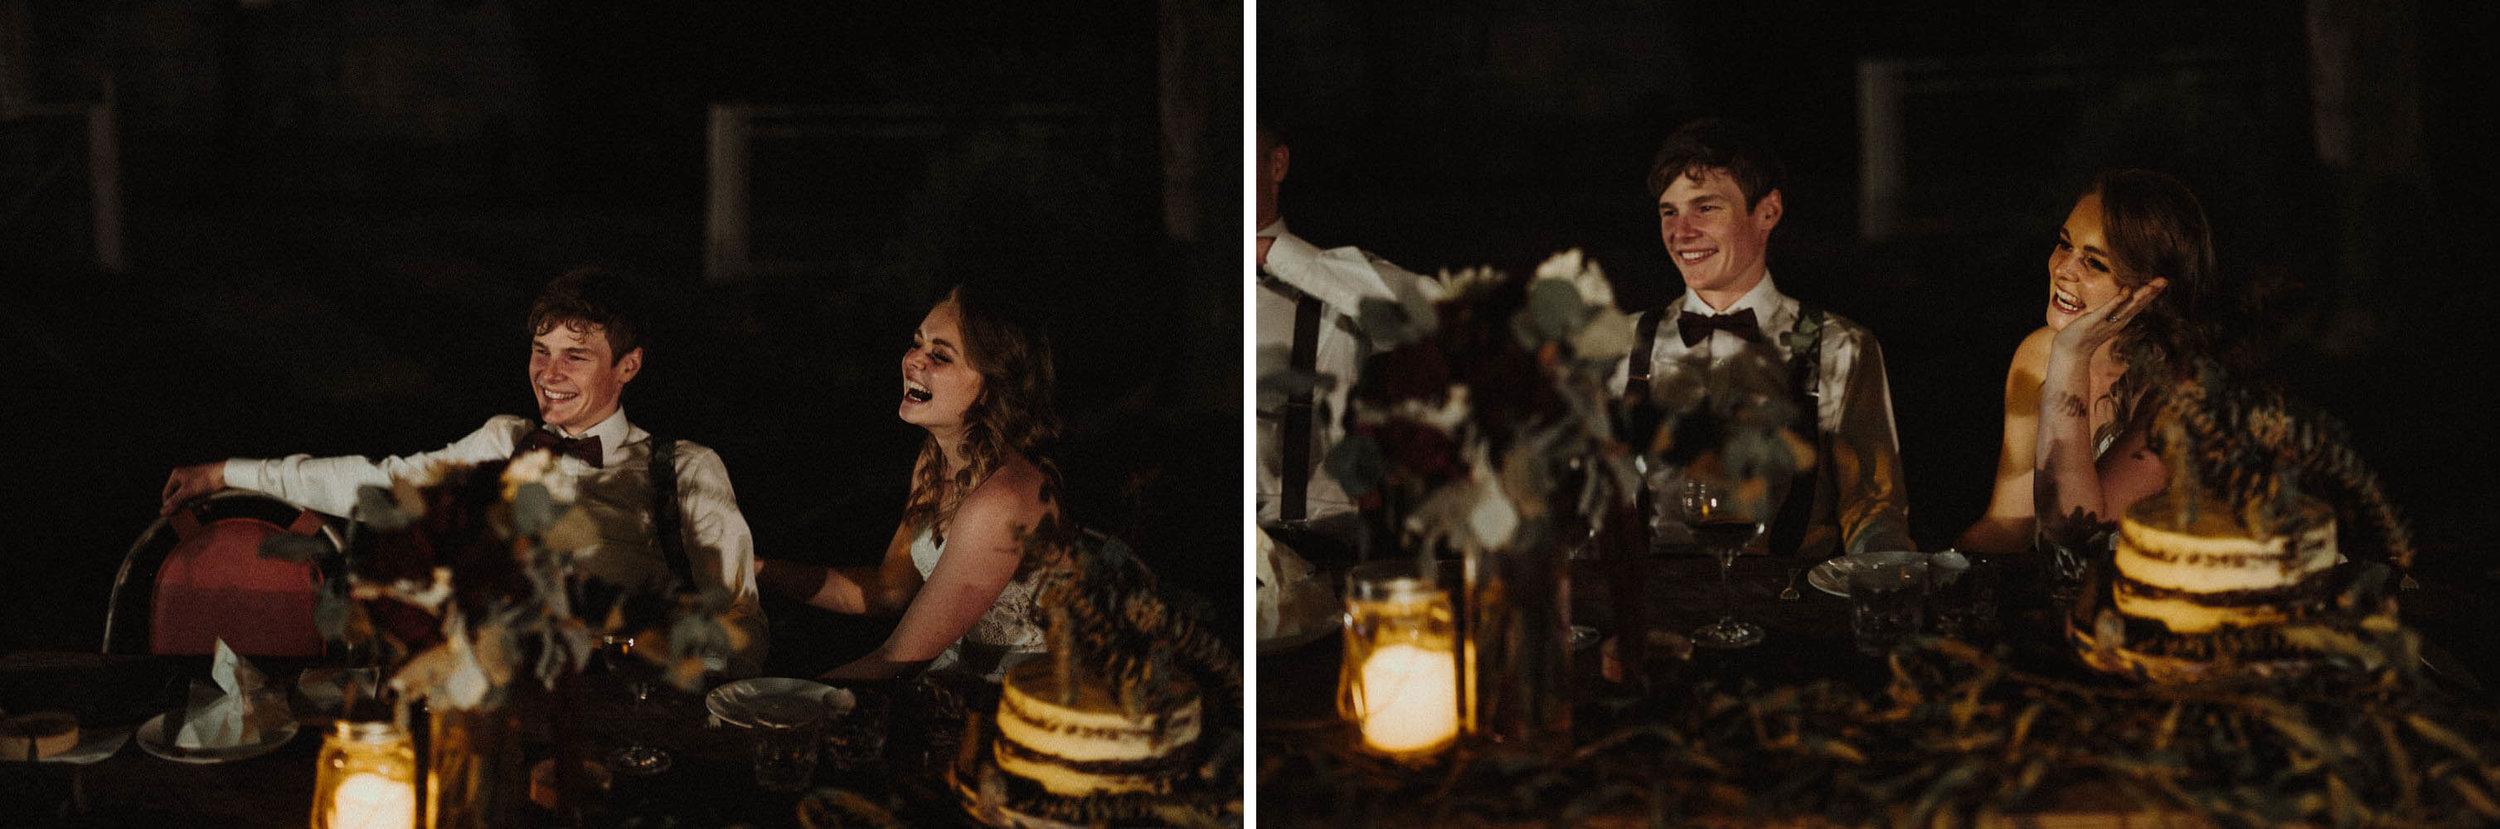 australian-wedding-photography_229(4526)2.jpg